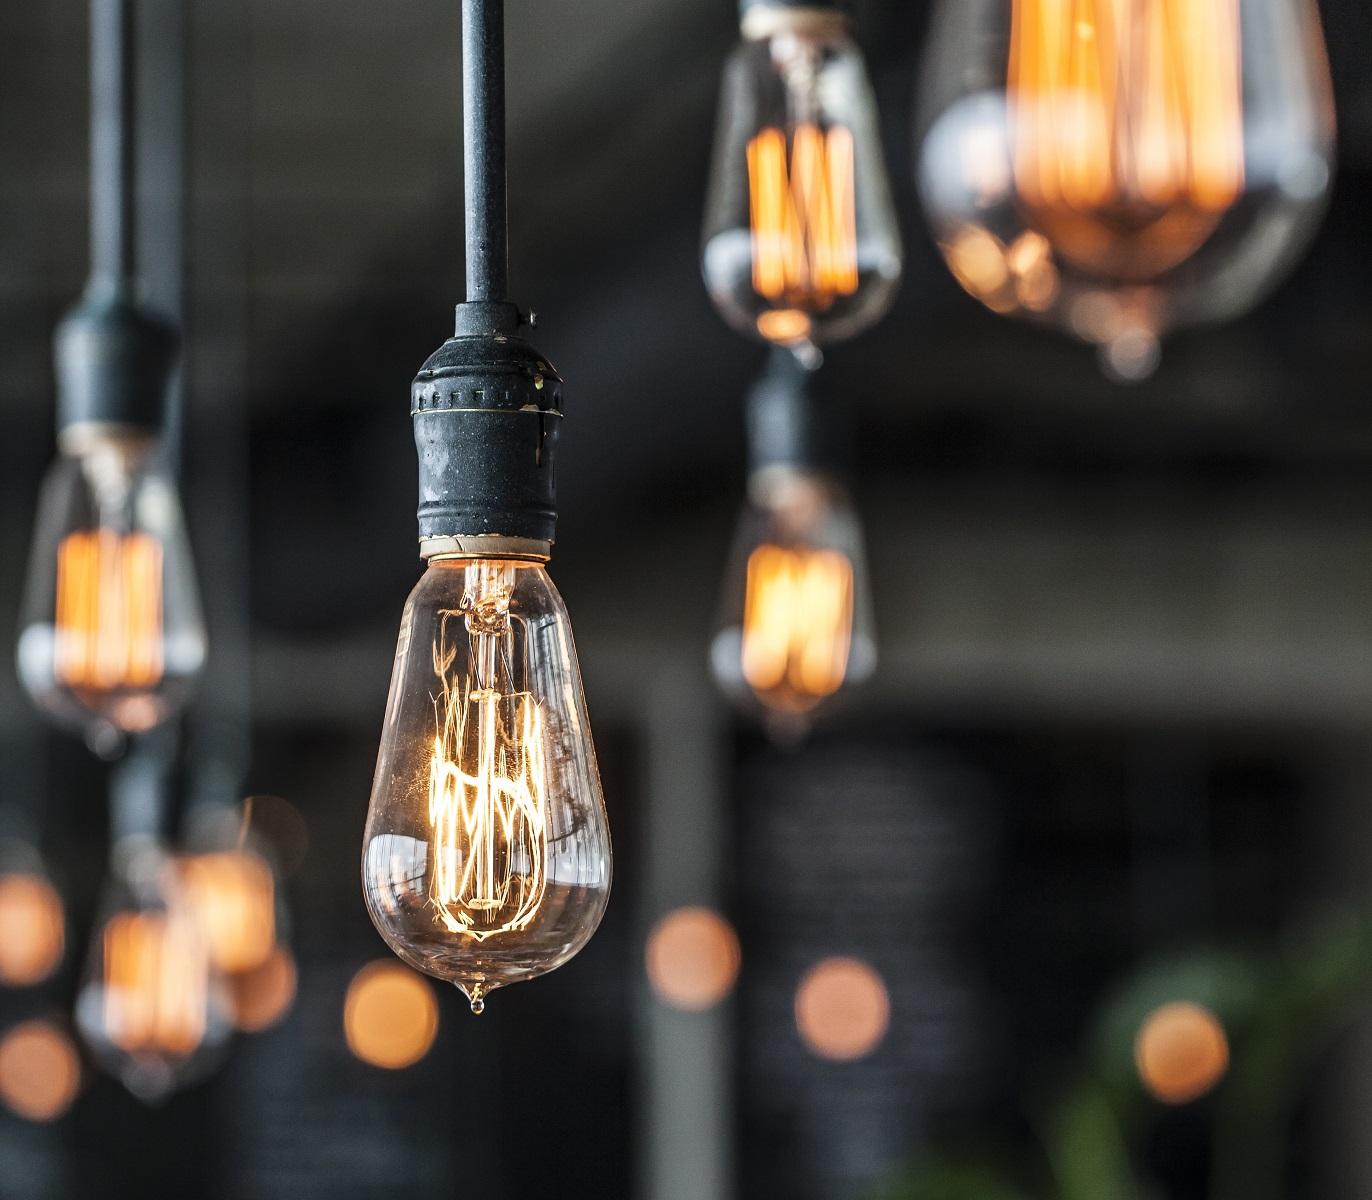 gestori luce e gas